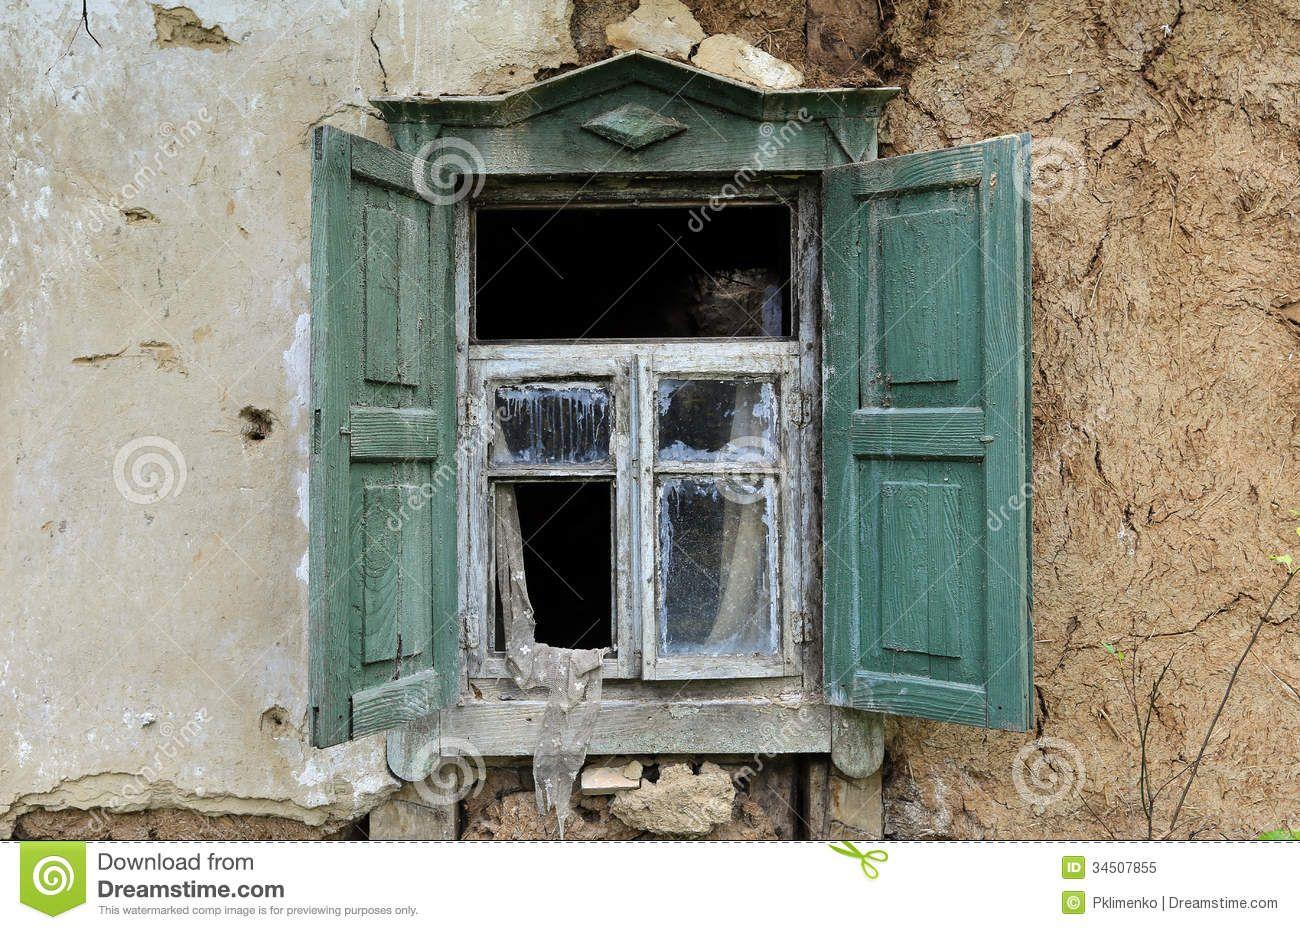 Old window | Old windows, House windows, Windows